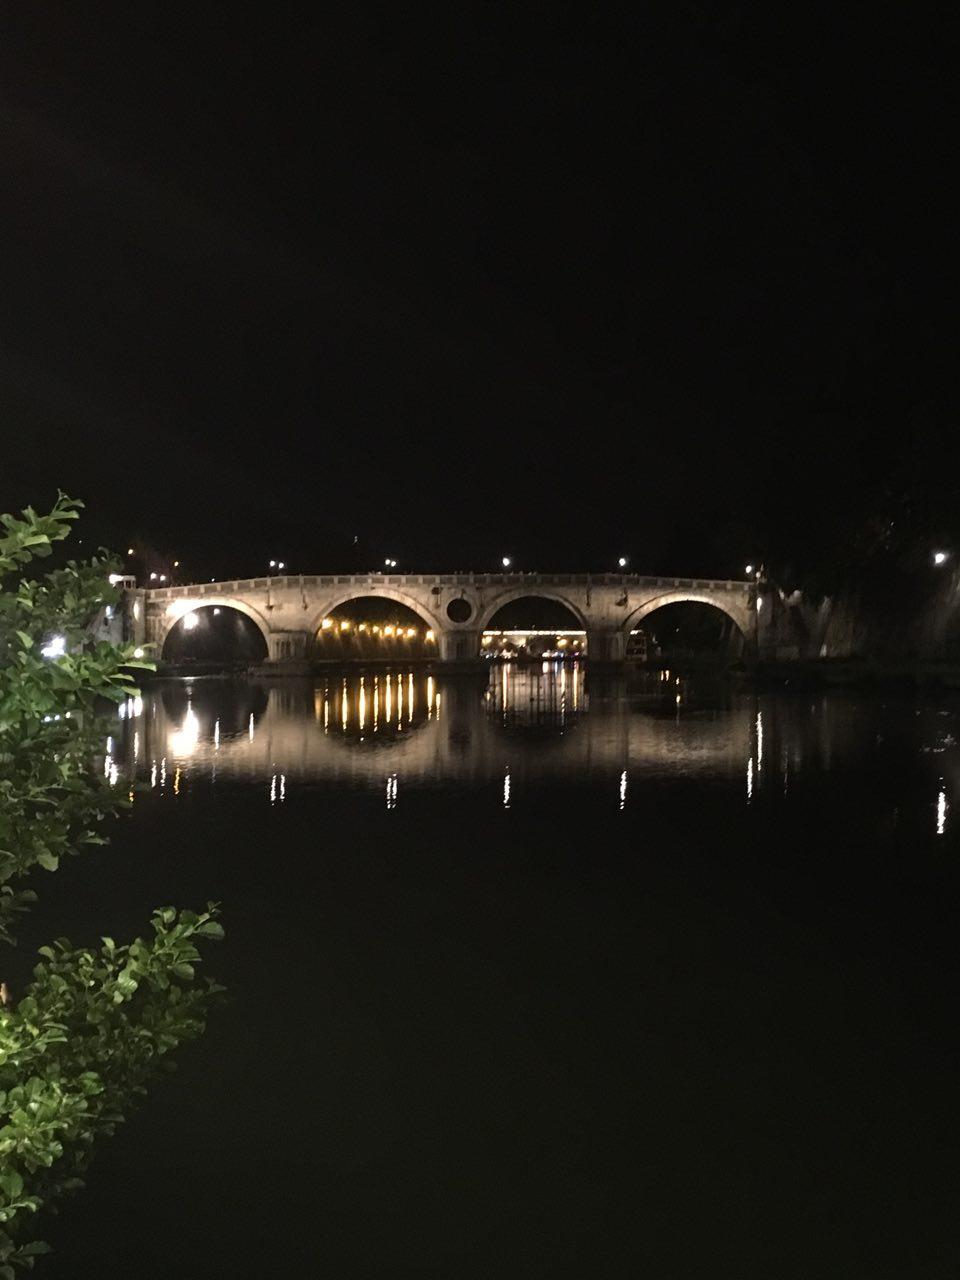 Roma lungo tevere, tevere roma, roma by night brideg